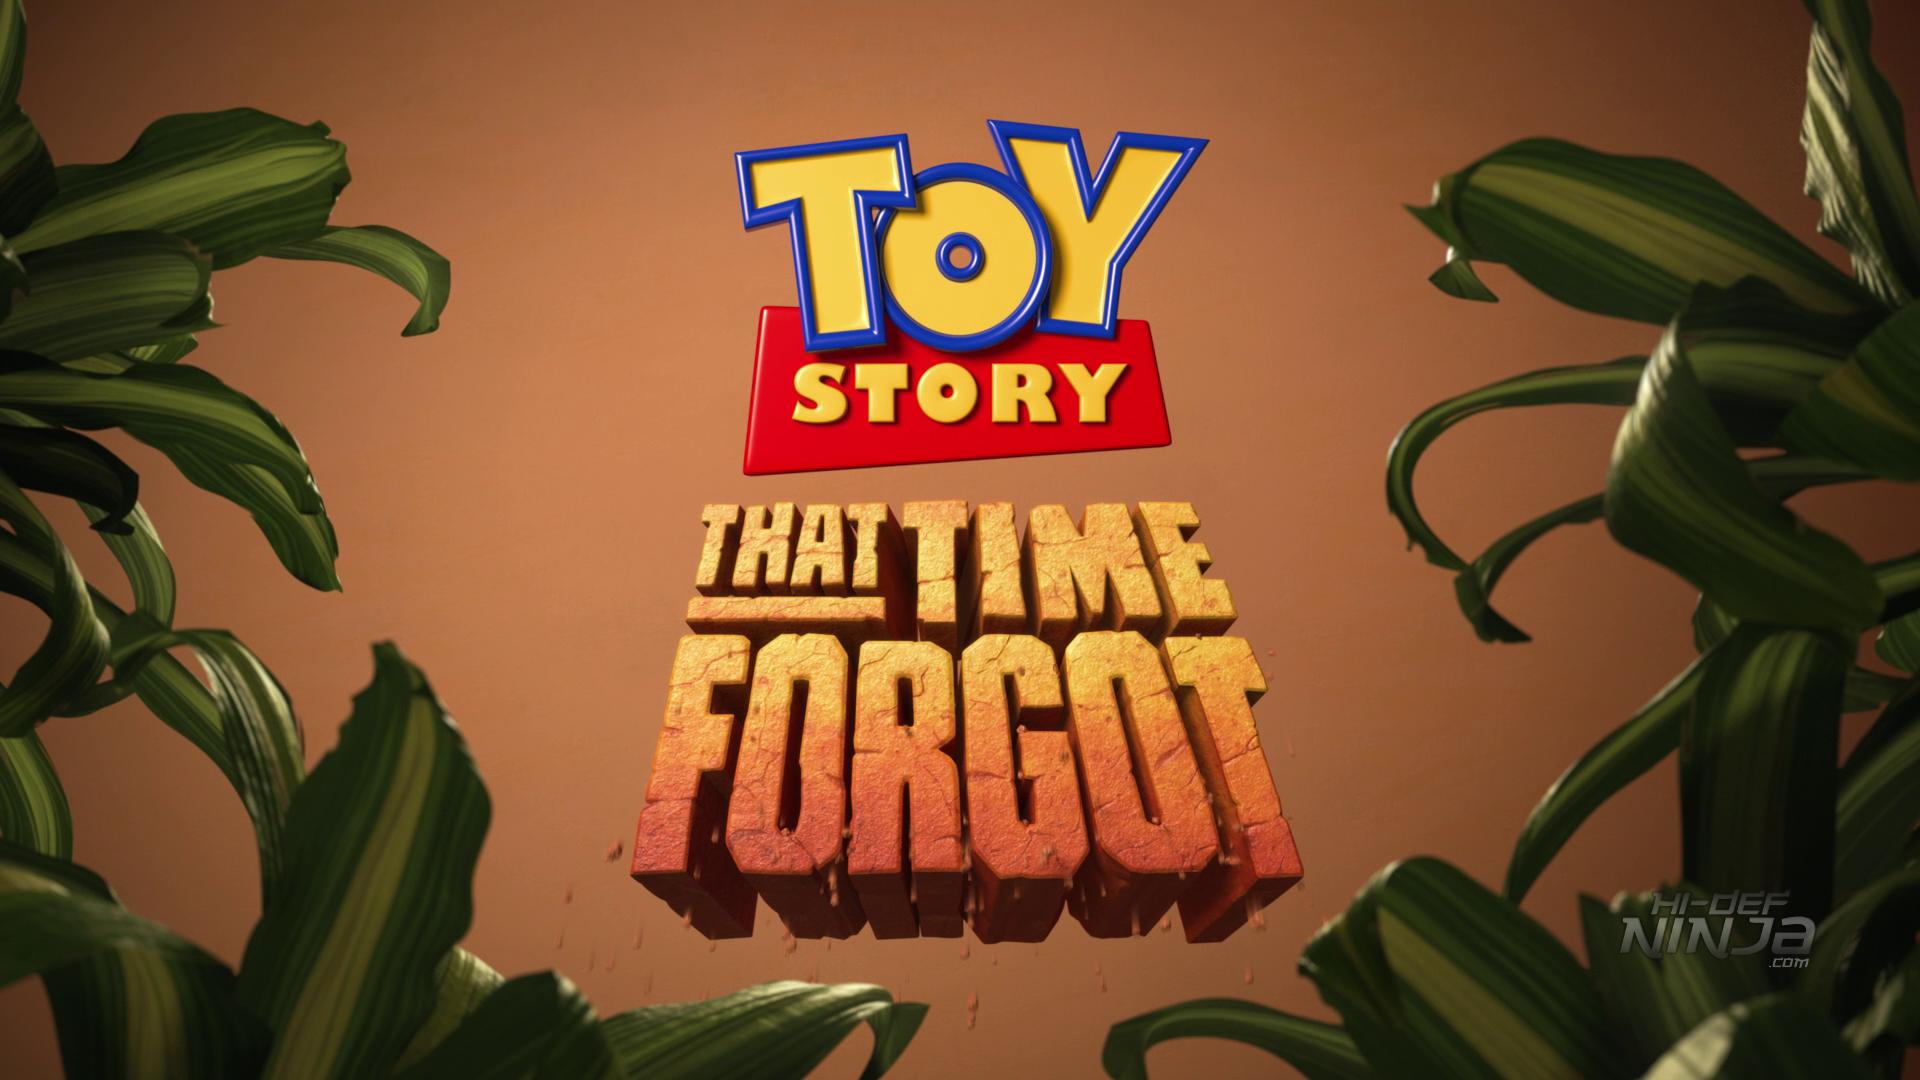 Toy-Story-Time-Forgot-HiDefNinja (1)